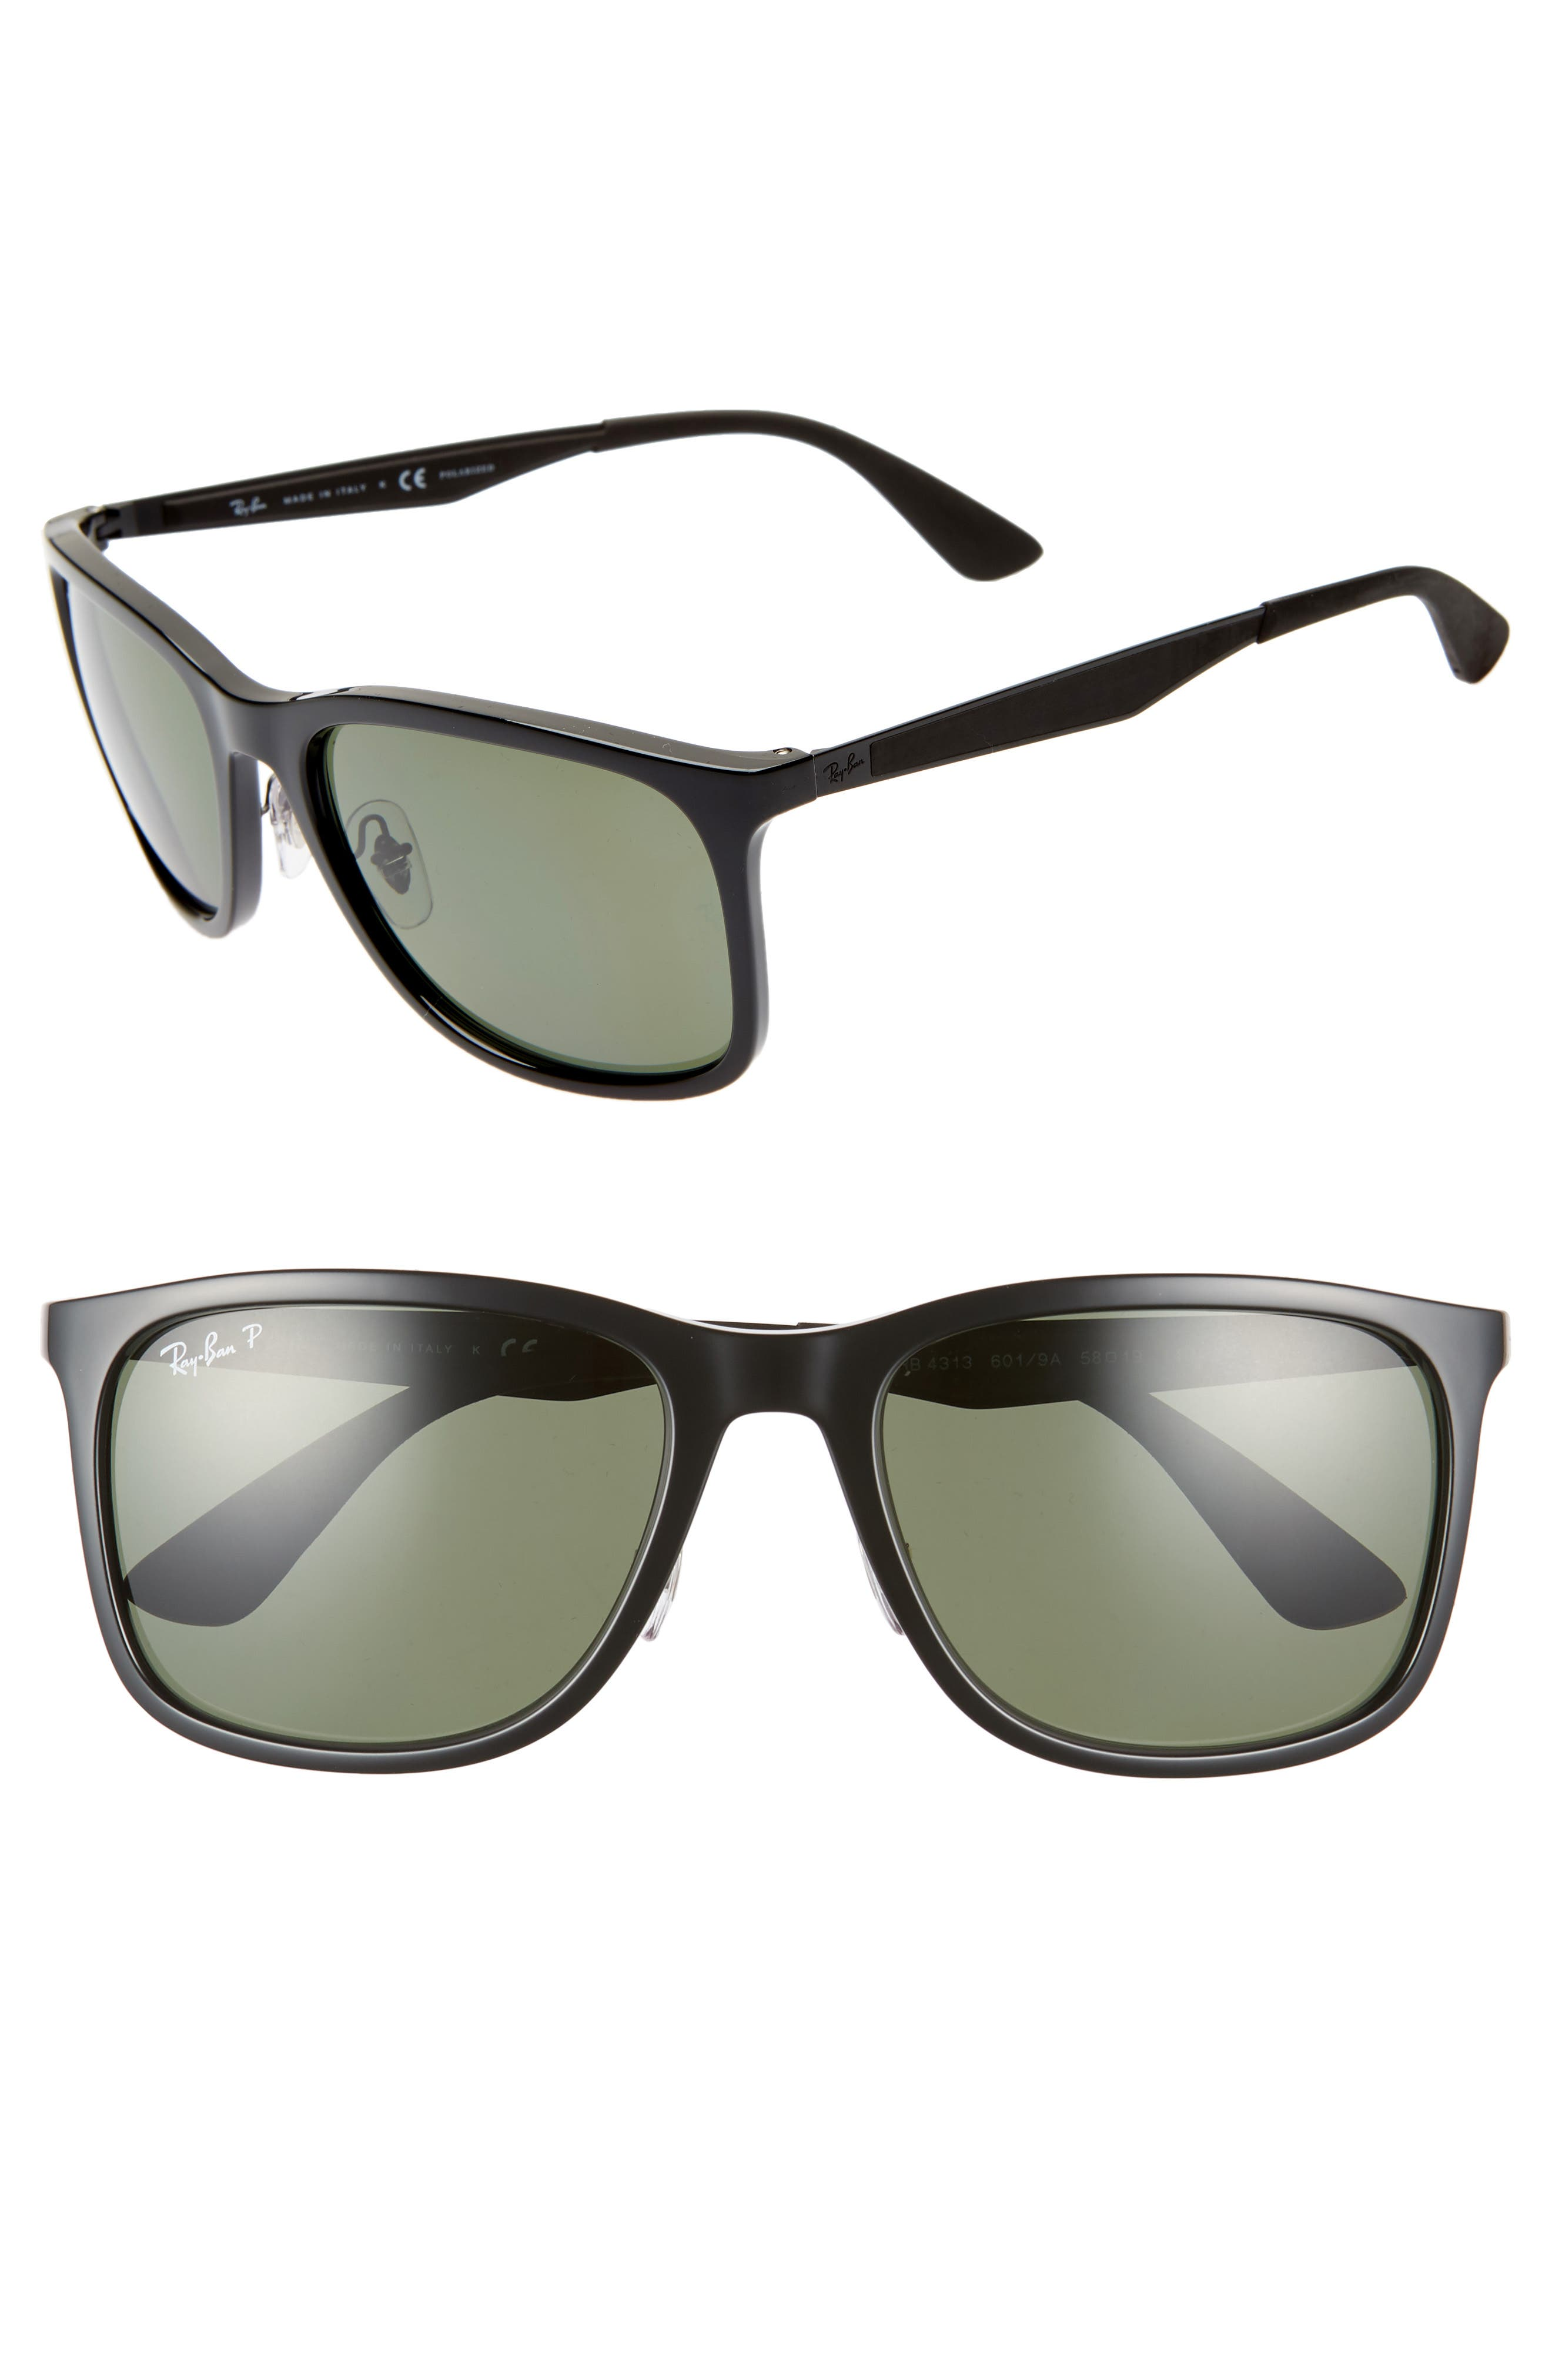 Ray-Ban 5m Polarized Sunglasses -